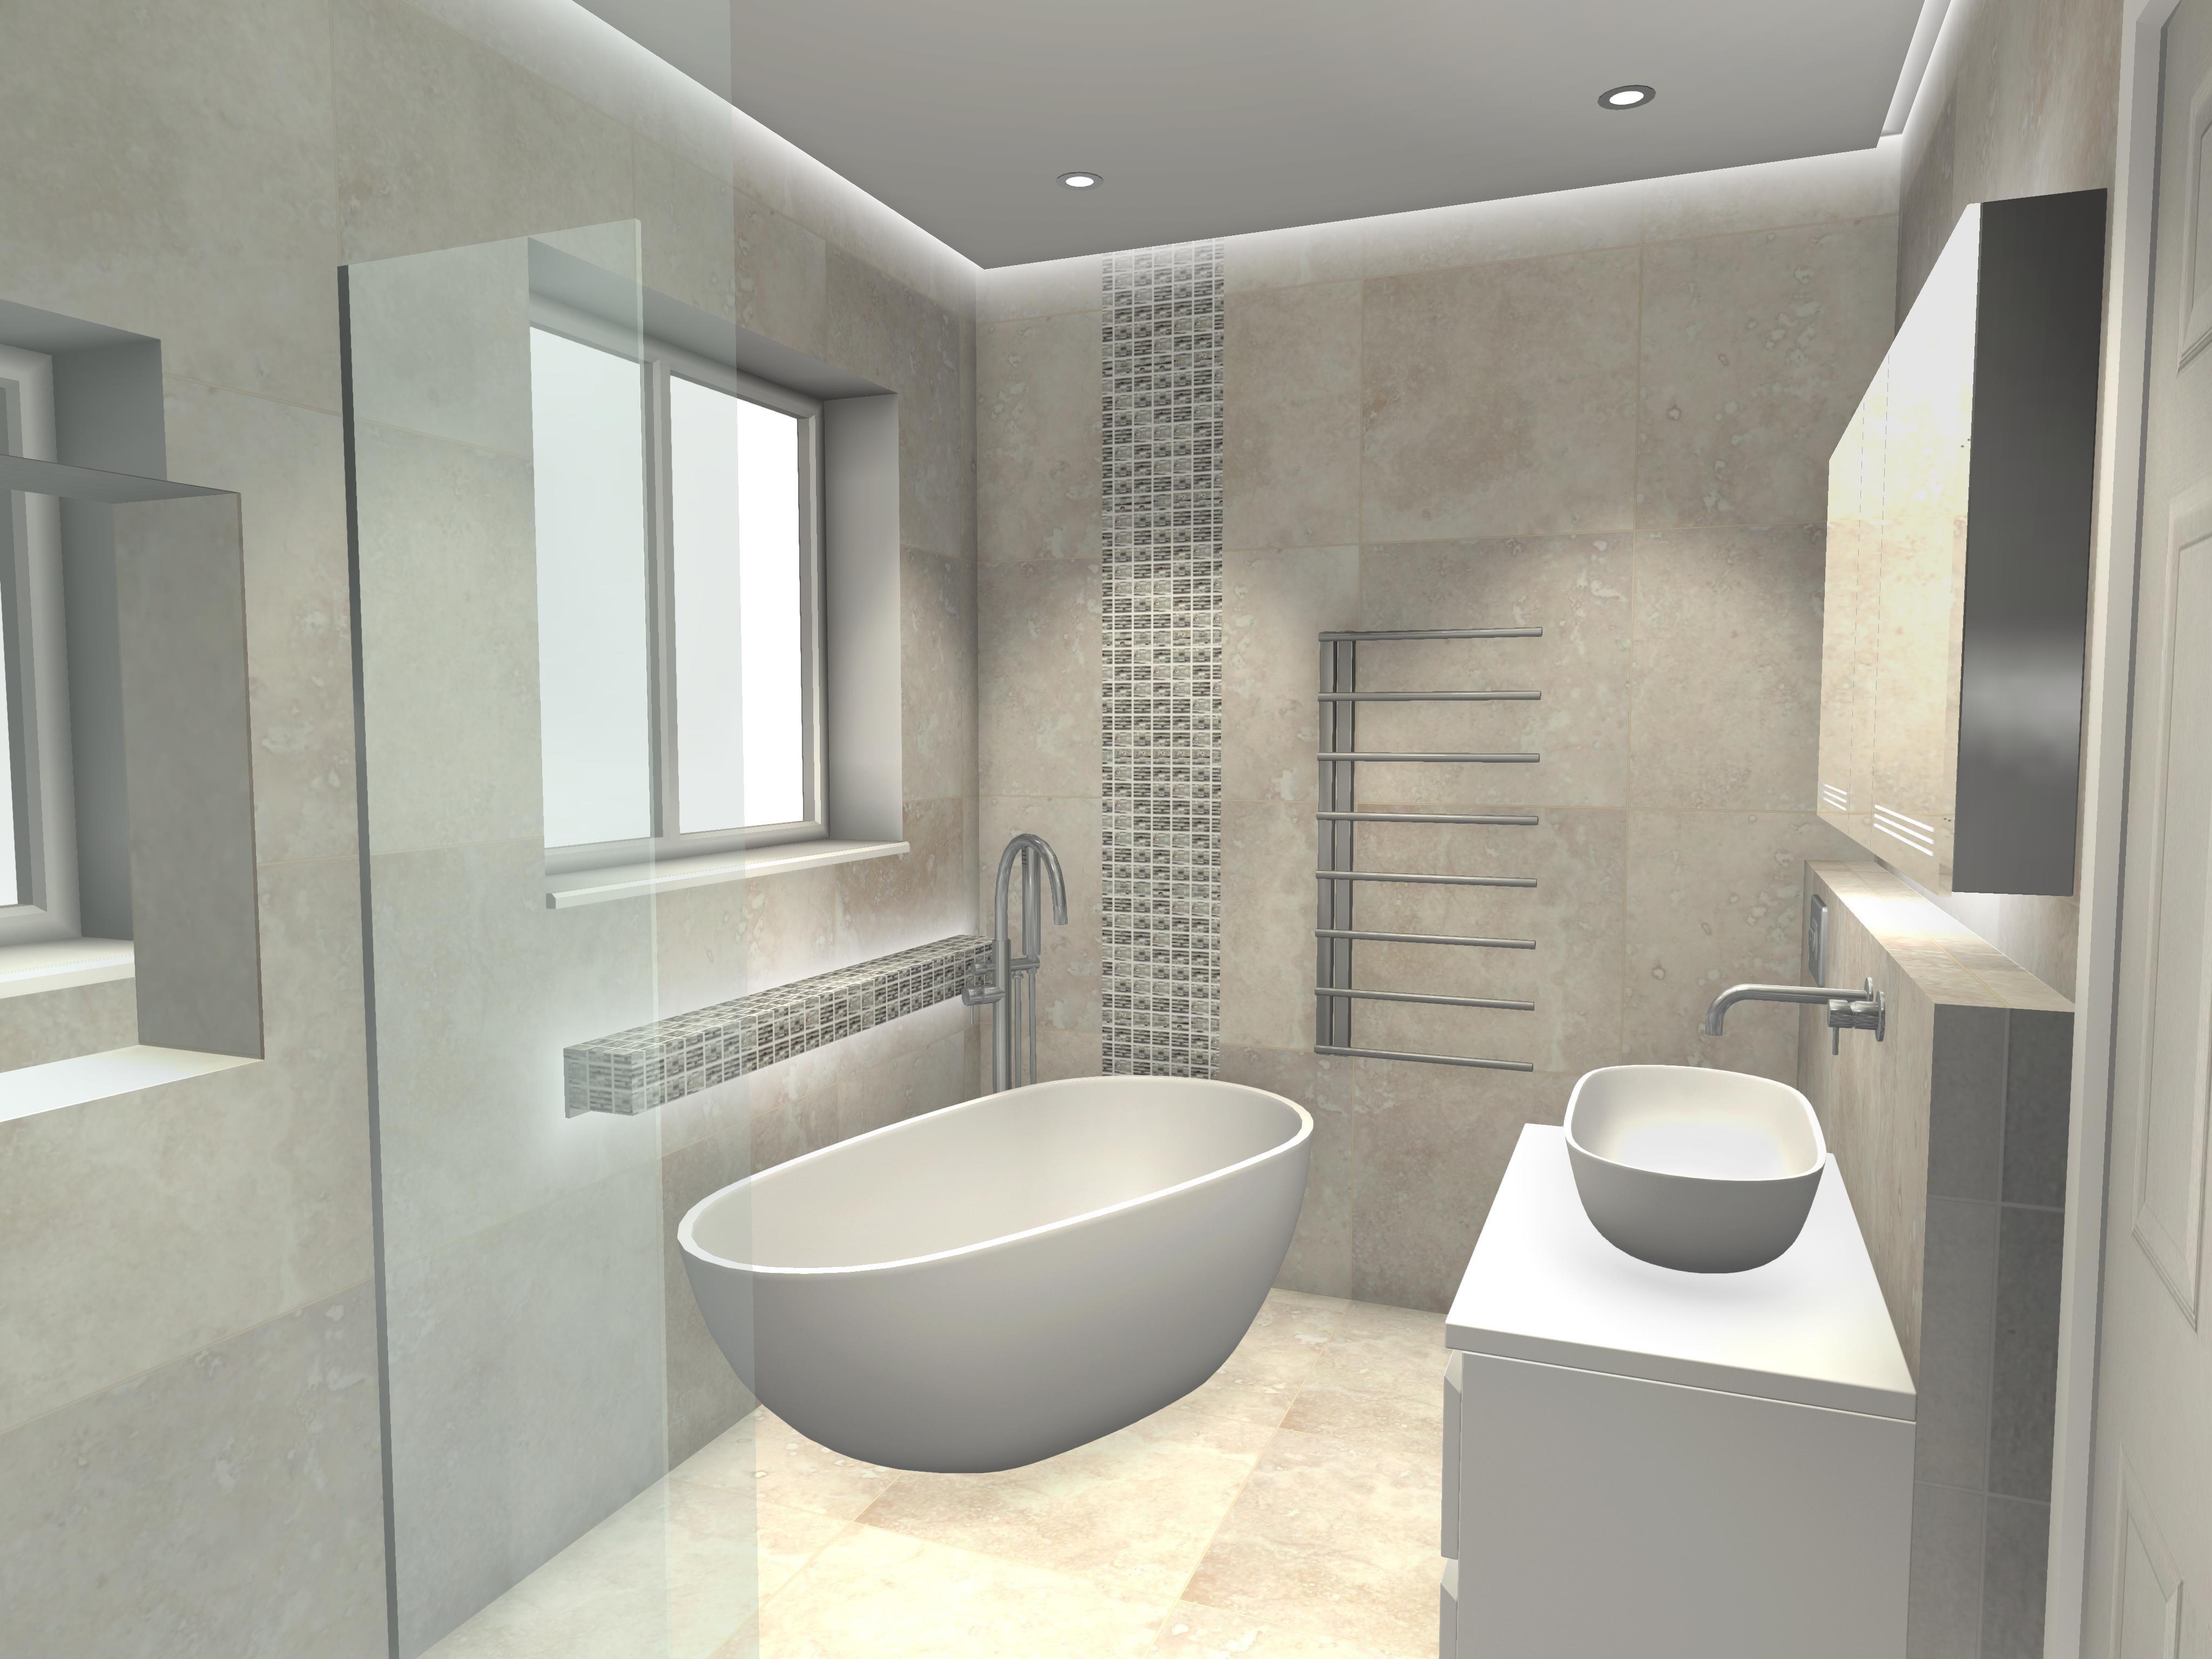 Room Type: Family Bathroom Designer: Nicky